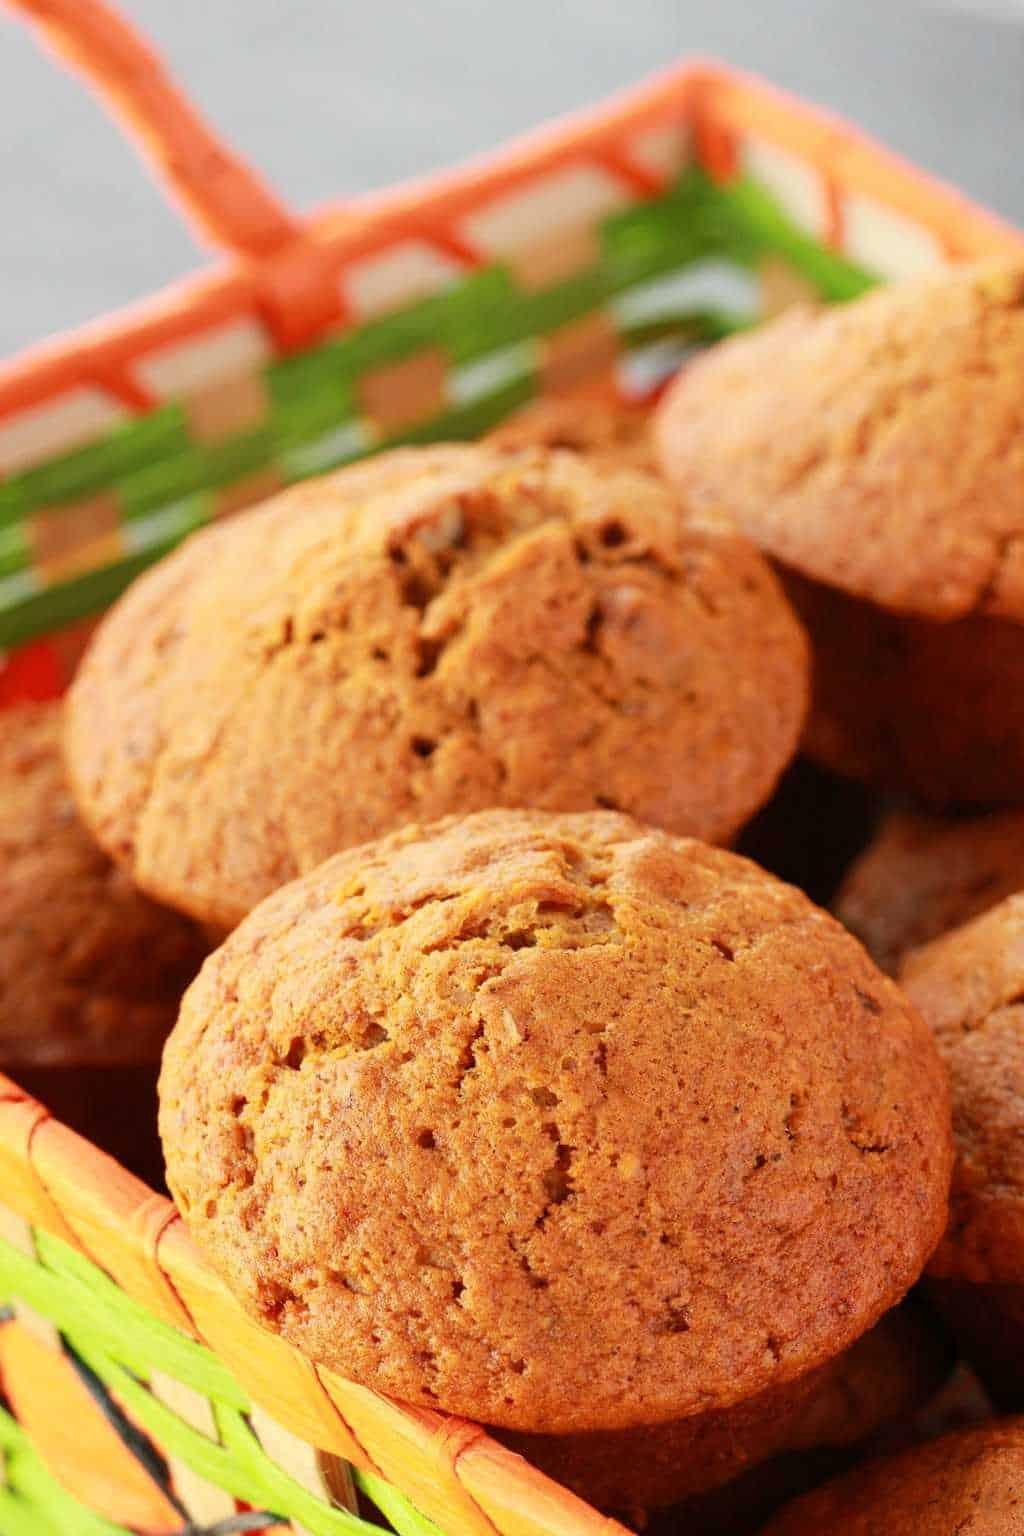 Vegan pumpkin muffins in an orange and green woven basket.